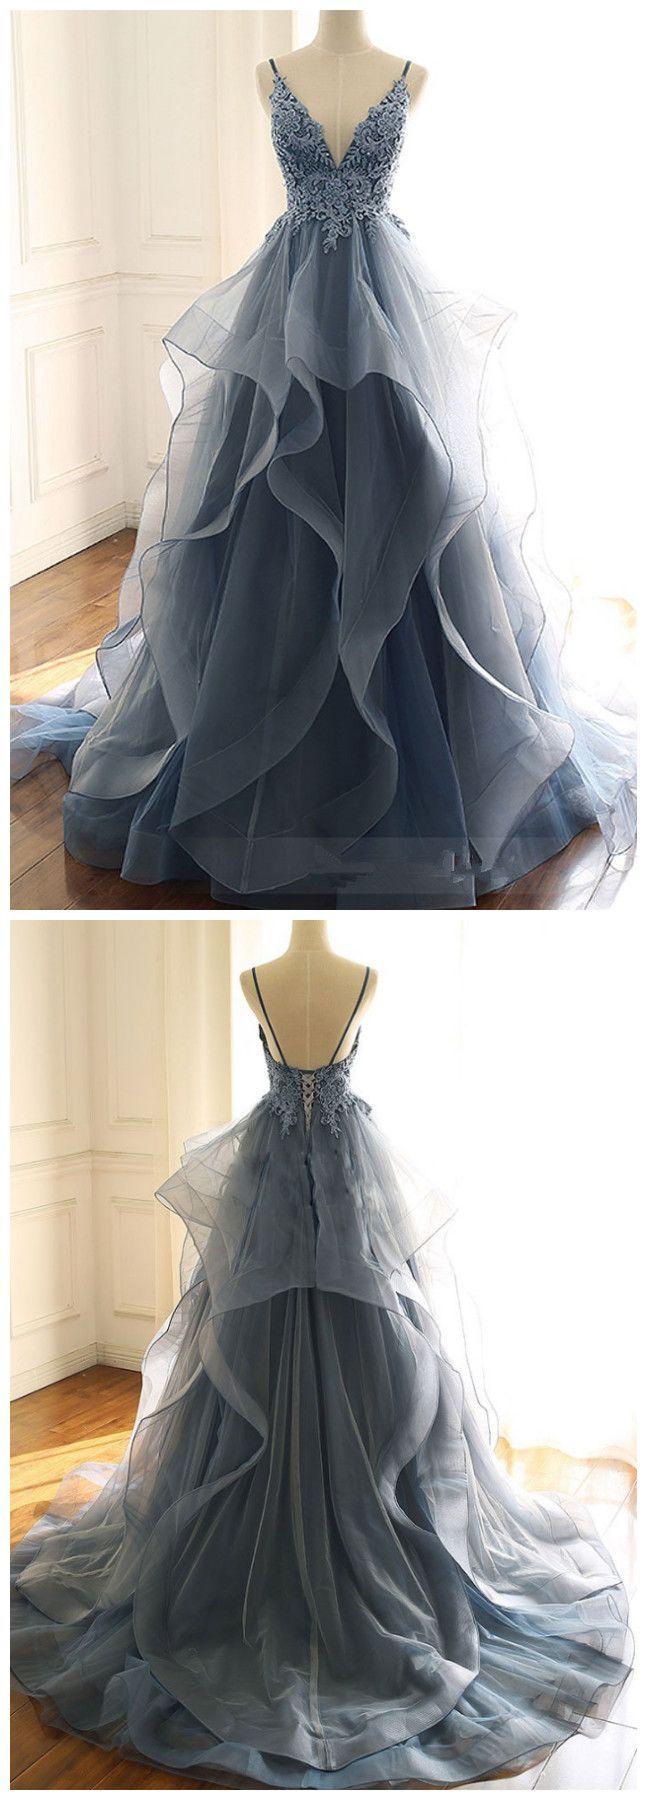 TULLE LACE LANG PROM KLEID, ABENDKLEID   - Festkleider - #Abendkleid #Festkleider #Kleid #Lace #lang #Prom #Tulle #promdresseslong